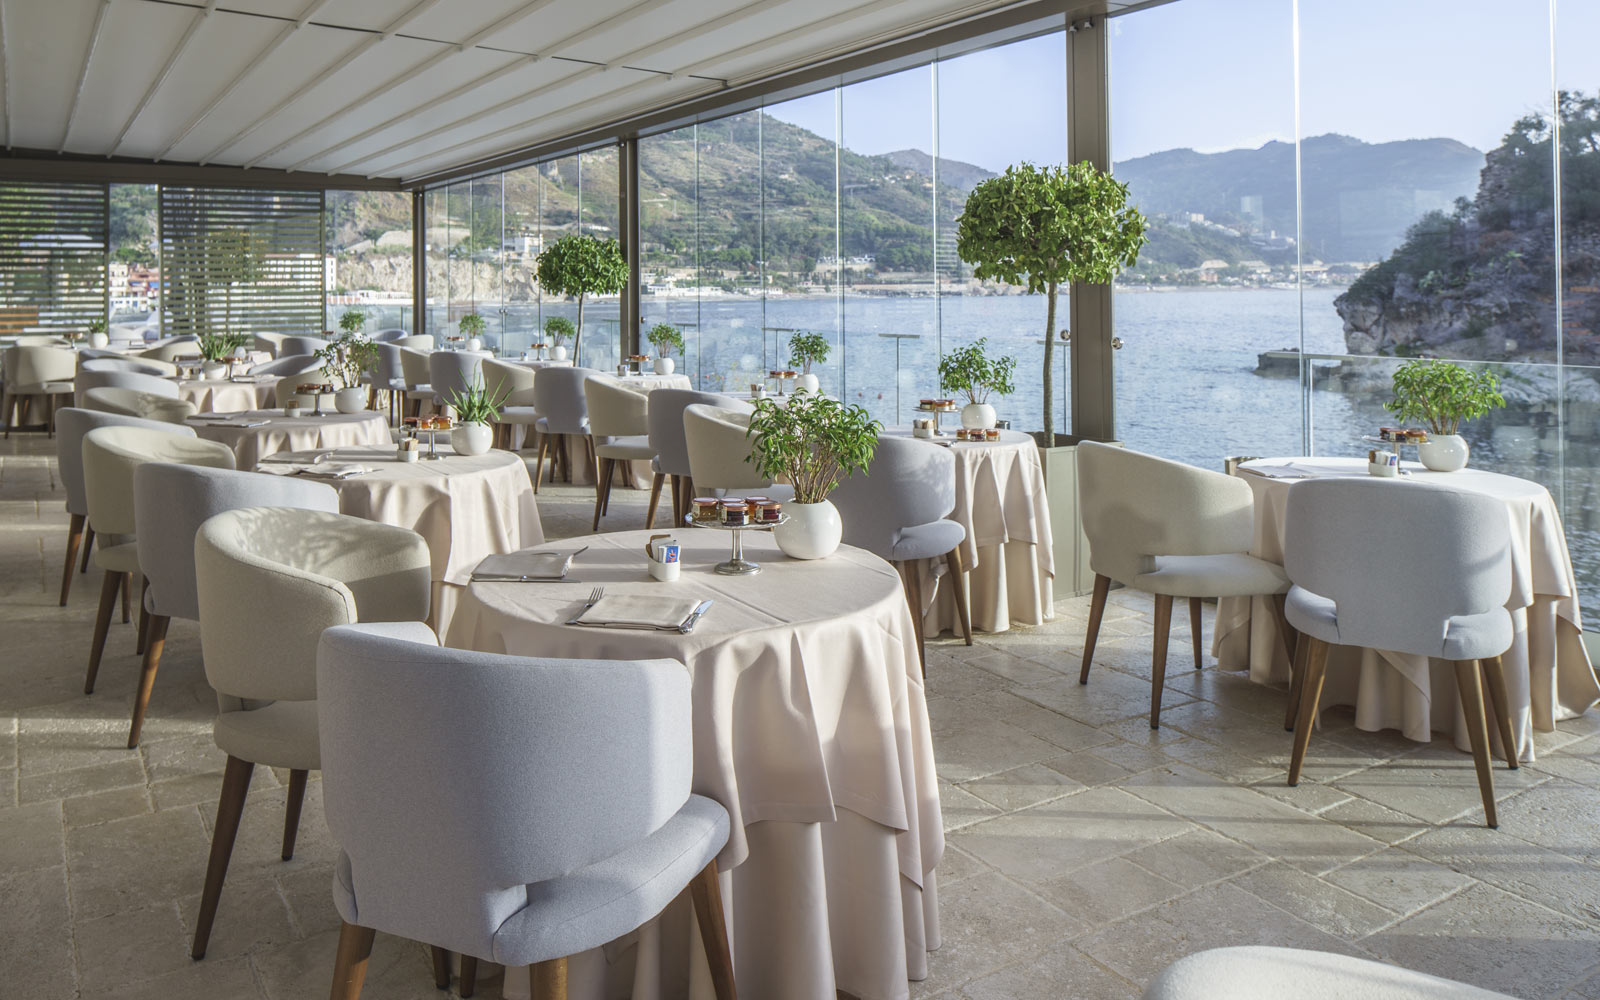 Ippocampo Restaurant at Grand Hotel Atlantis Bay